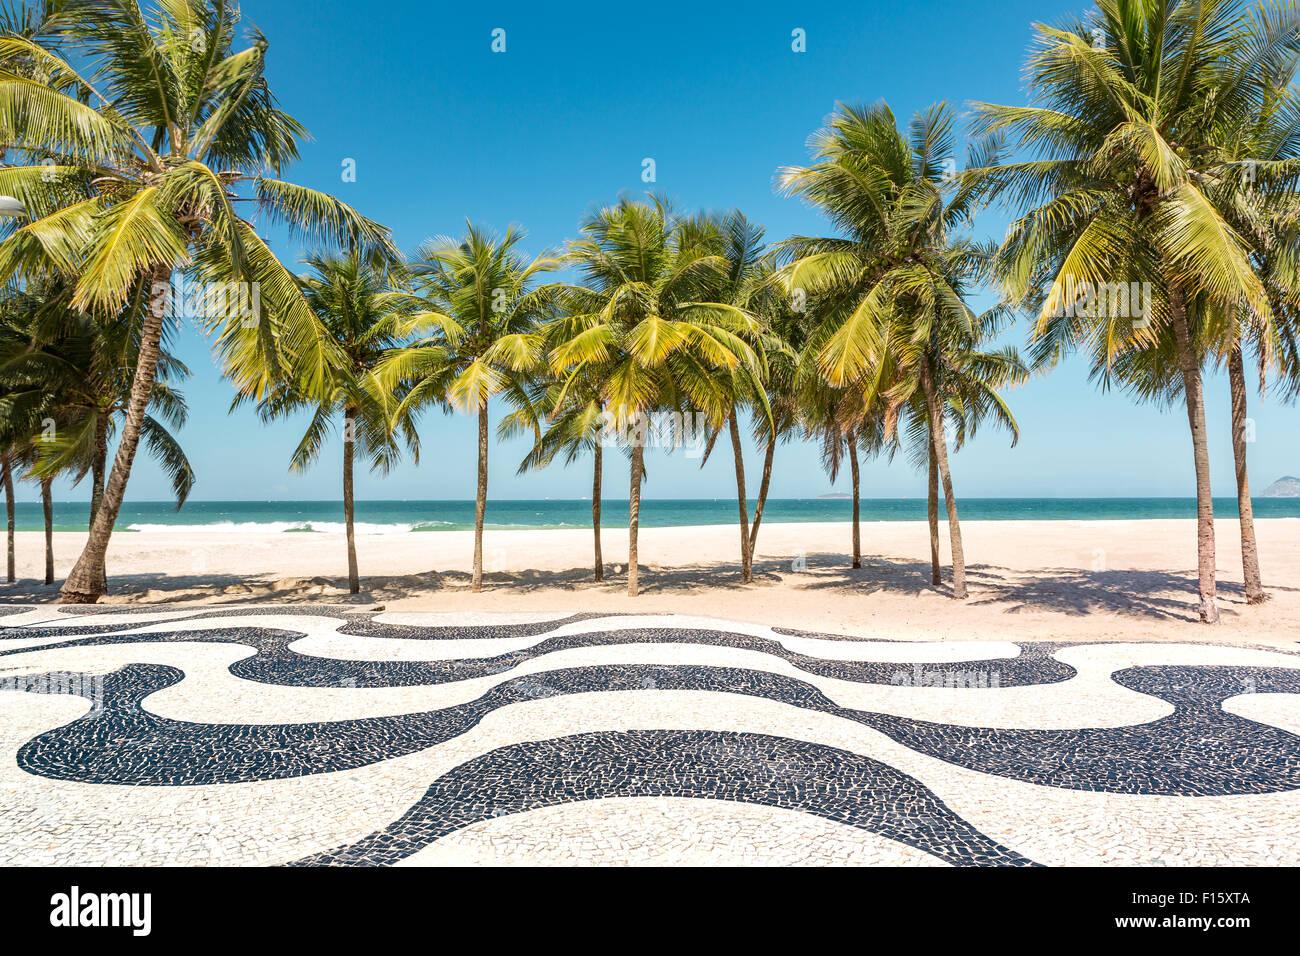 Palmen Sie und dem berühmten Copacabana Strand Mosaik Bürgersteig in Rio De Janeiro, Brasilien. Stockbild